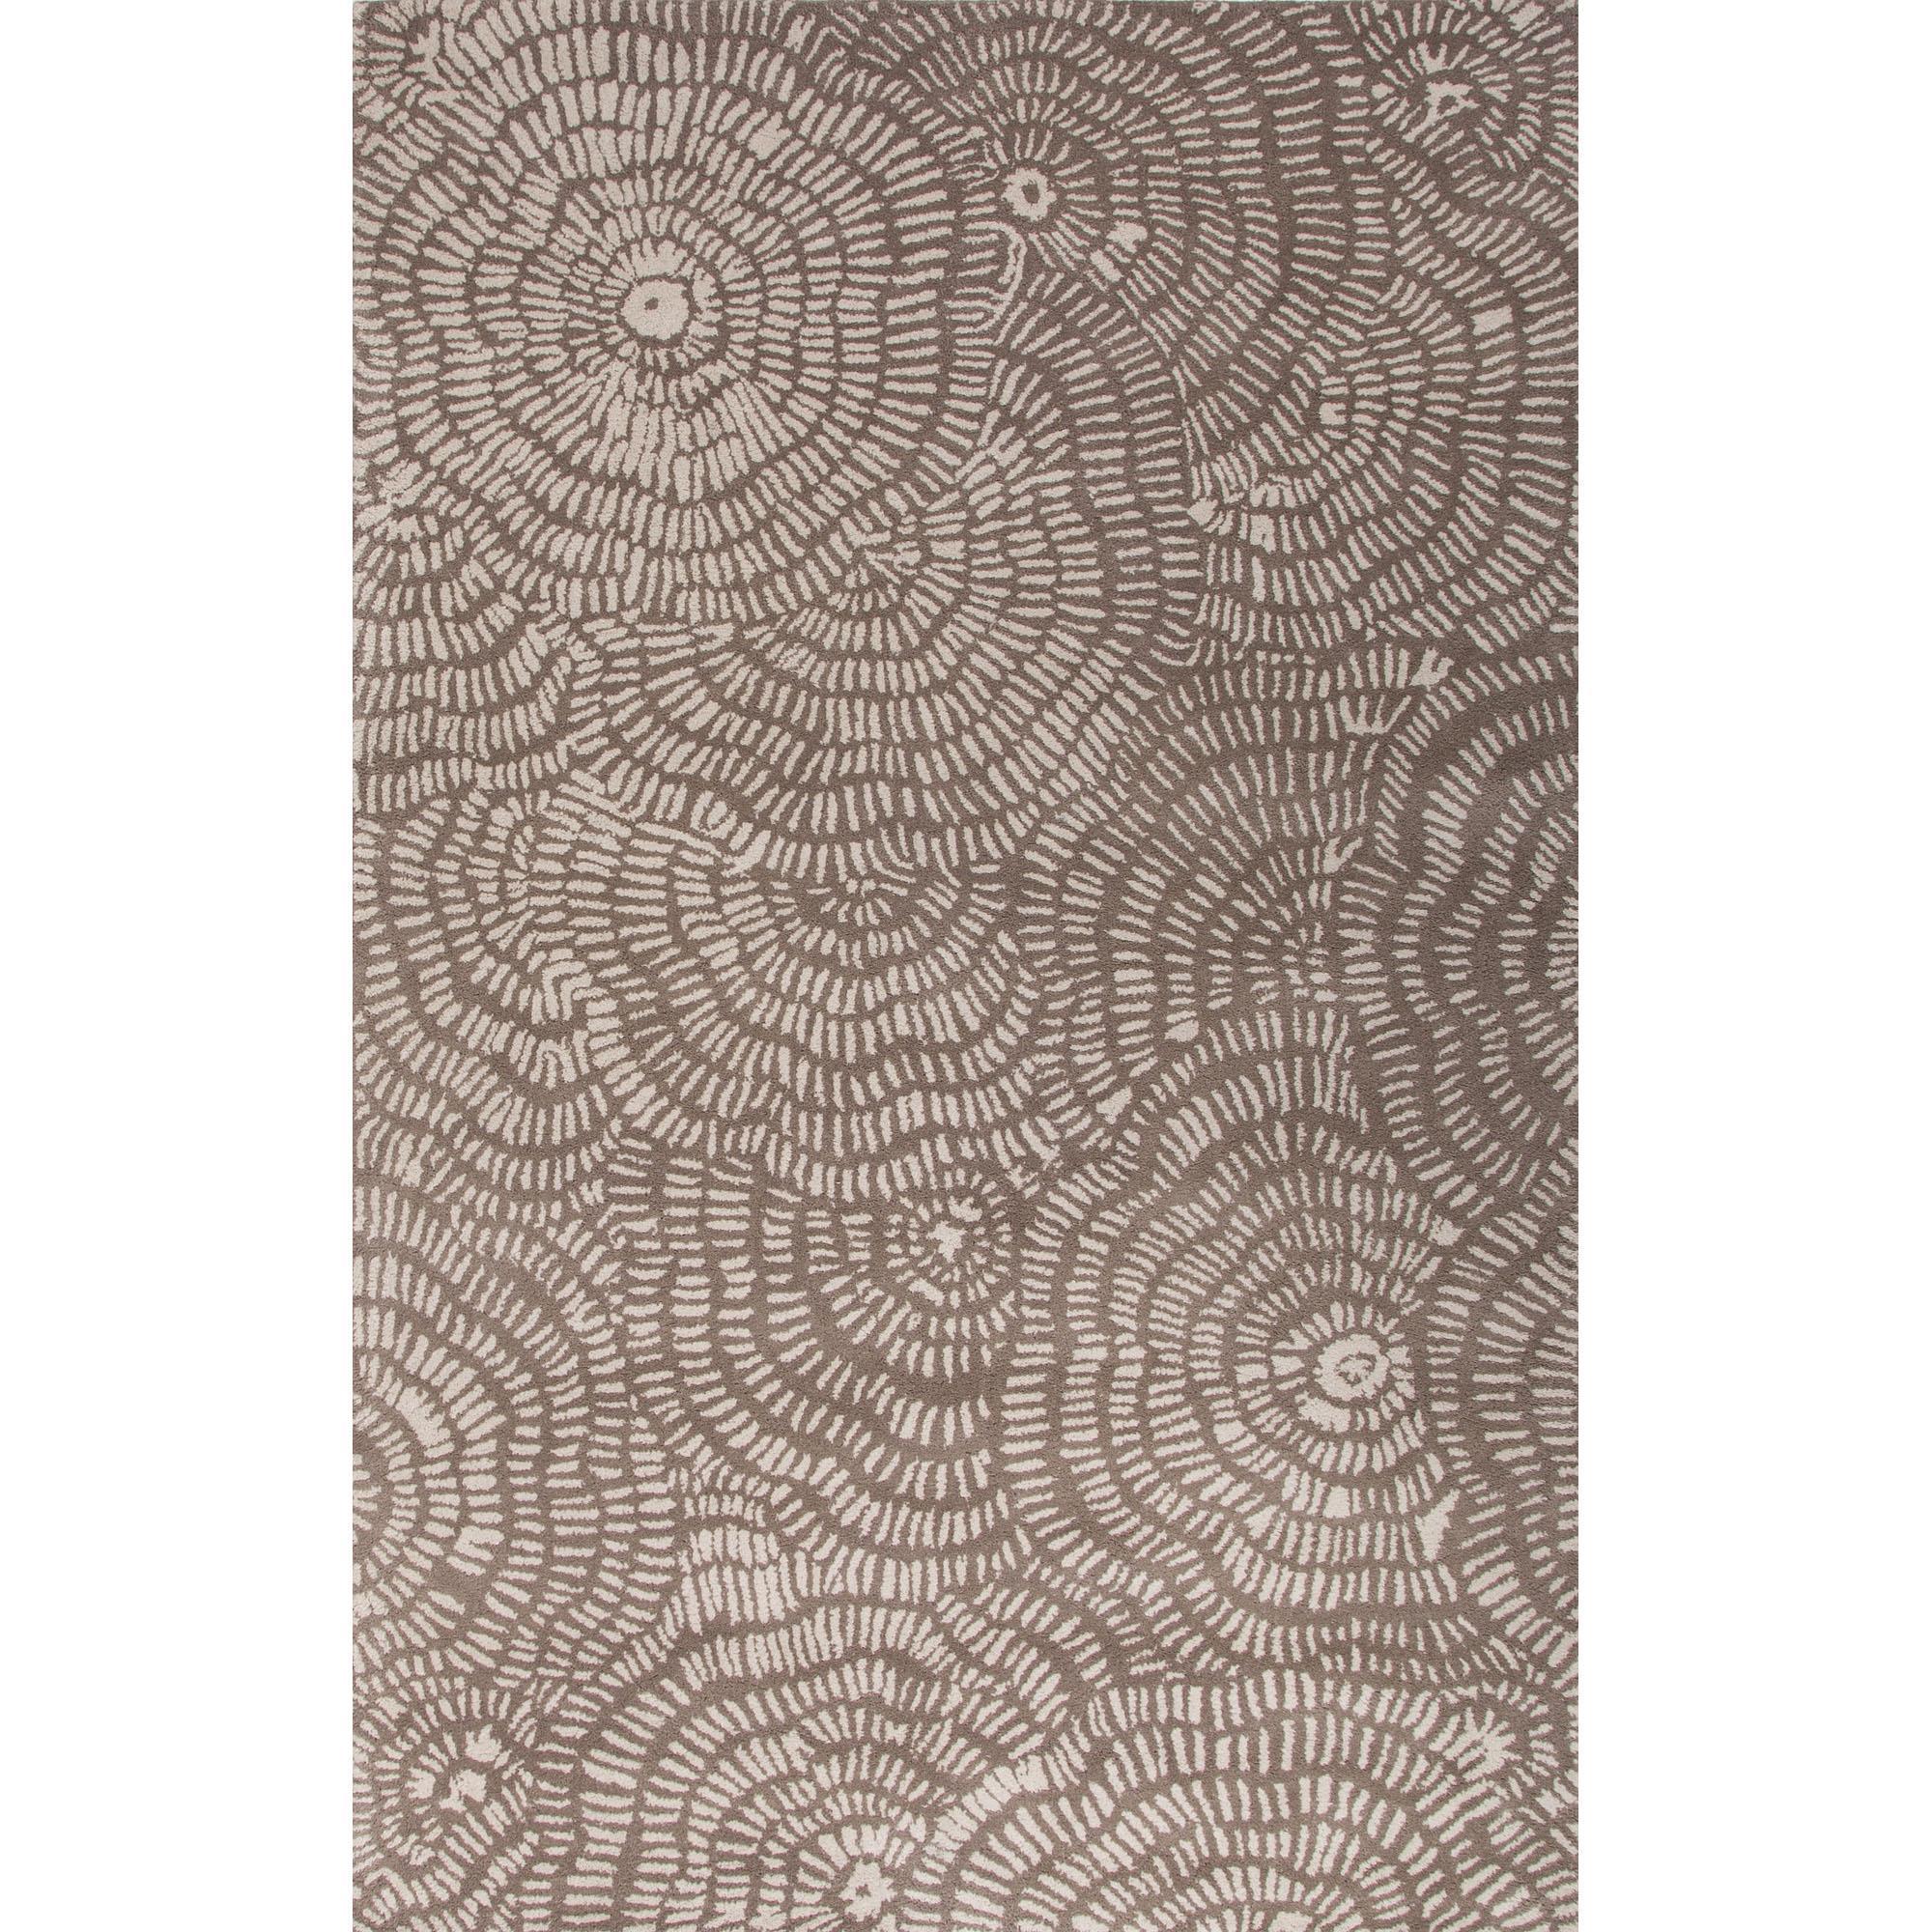 JAIPUR Rugs En Casa By Luli Sanchez Tufted 5 x 8 Rug - Item Number: RUG115942